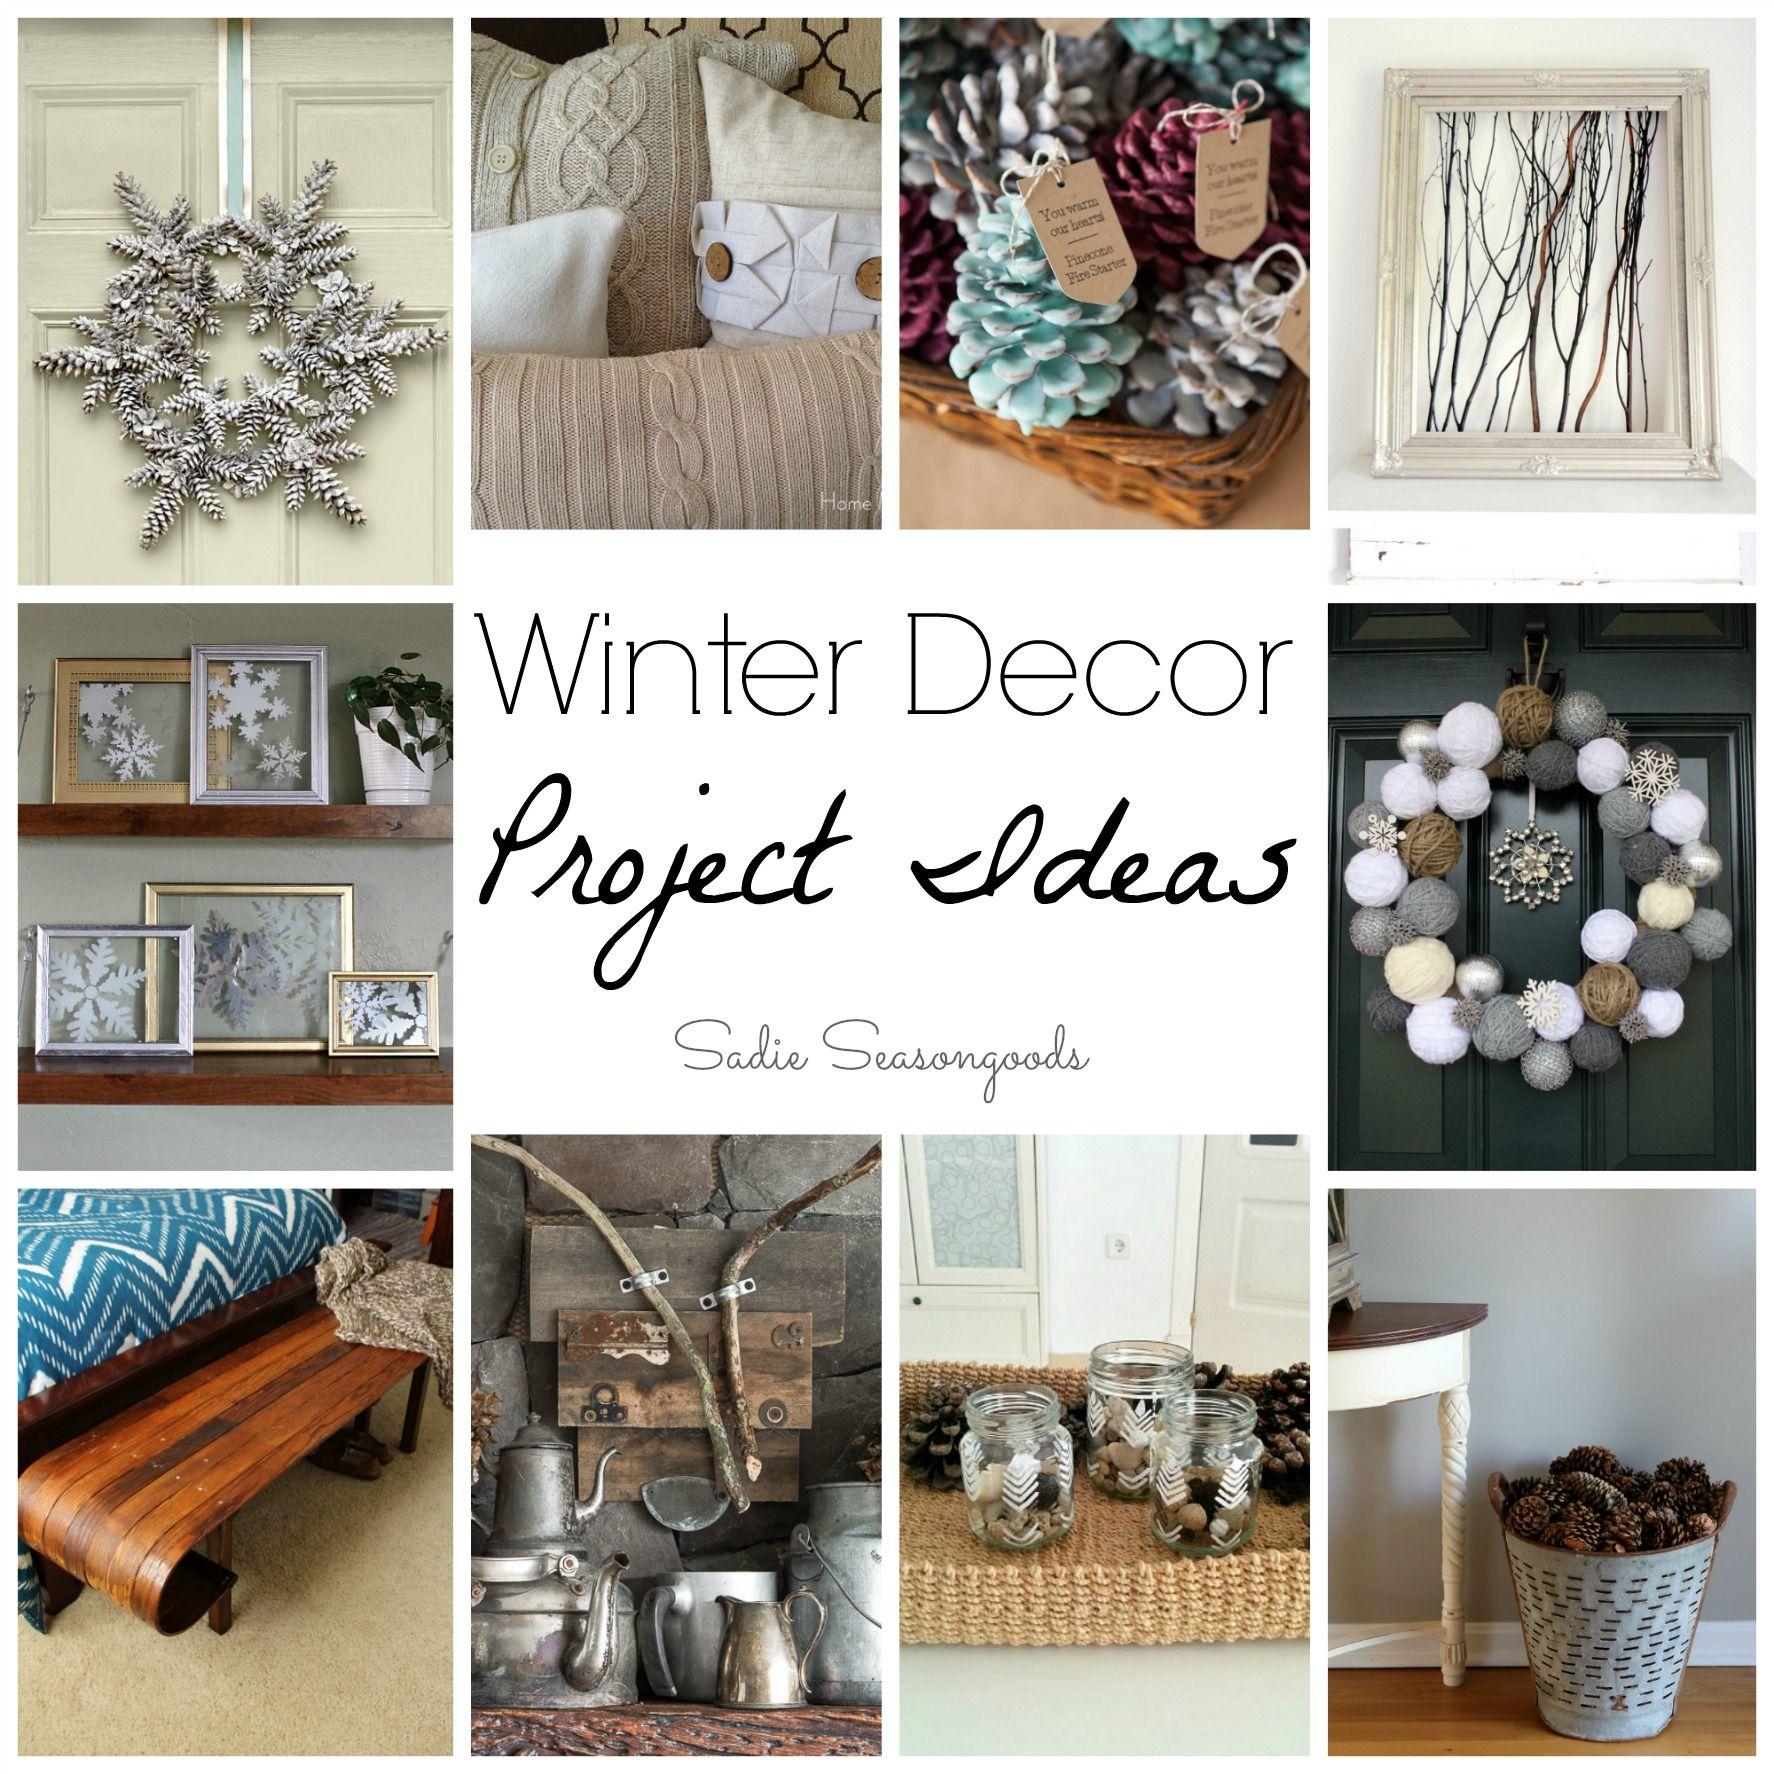 Winter Decor Ideas And Non Christmas Winter Decorations Winter Decor Decor Upcycle Decor